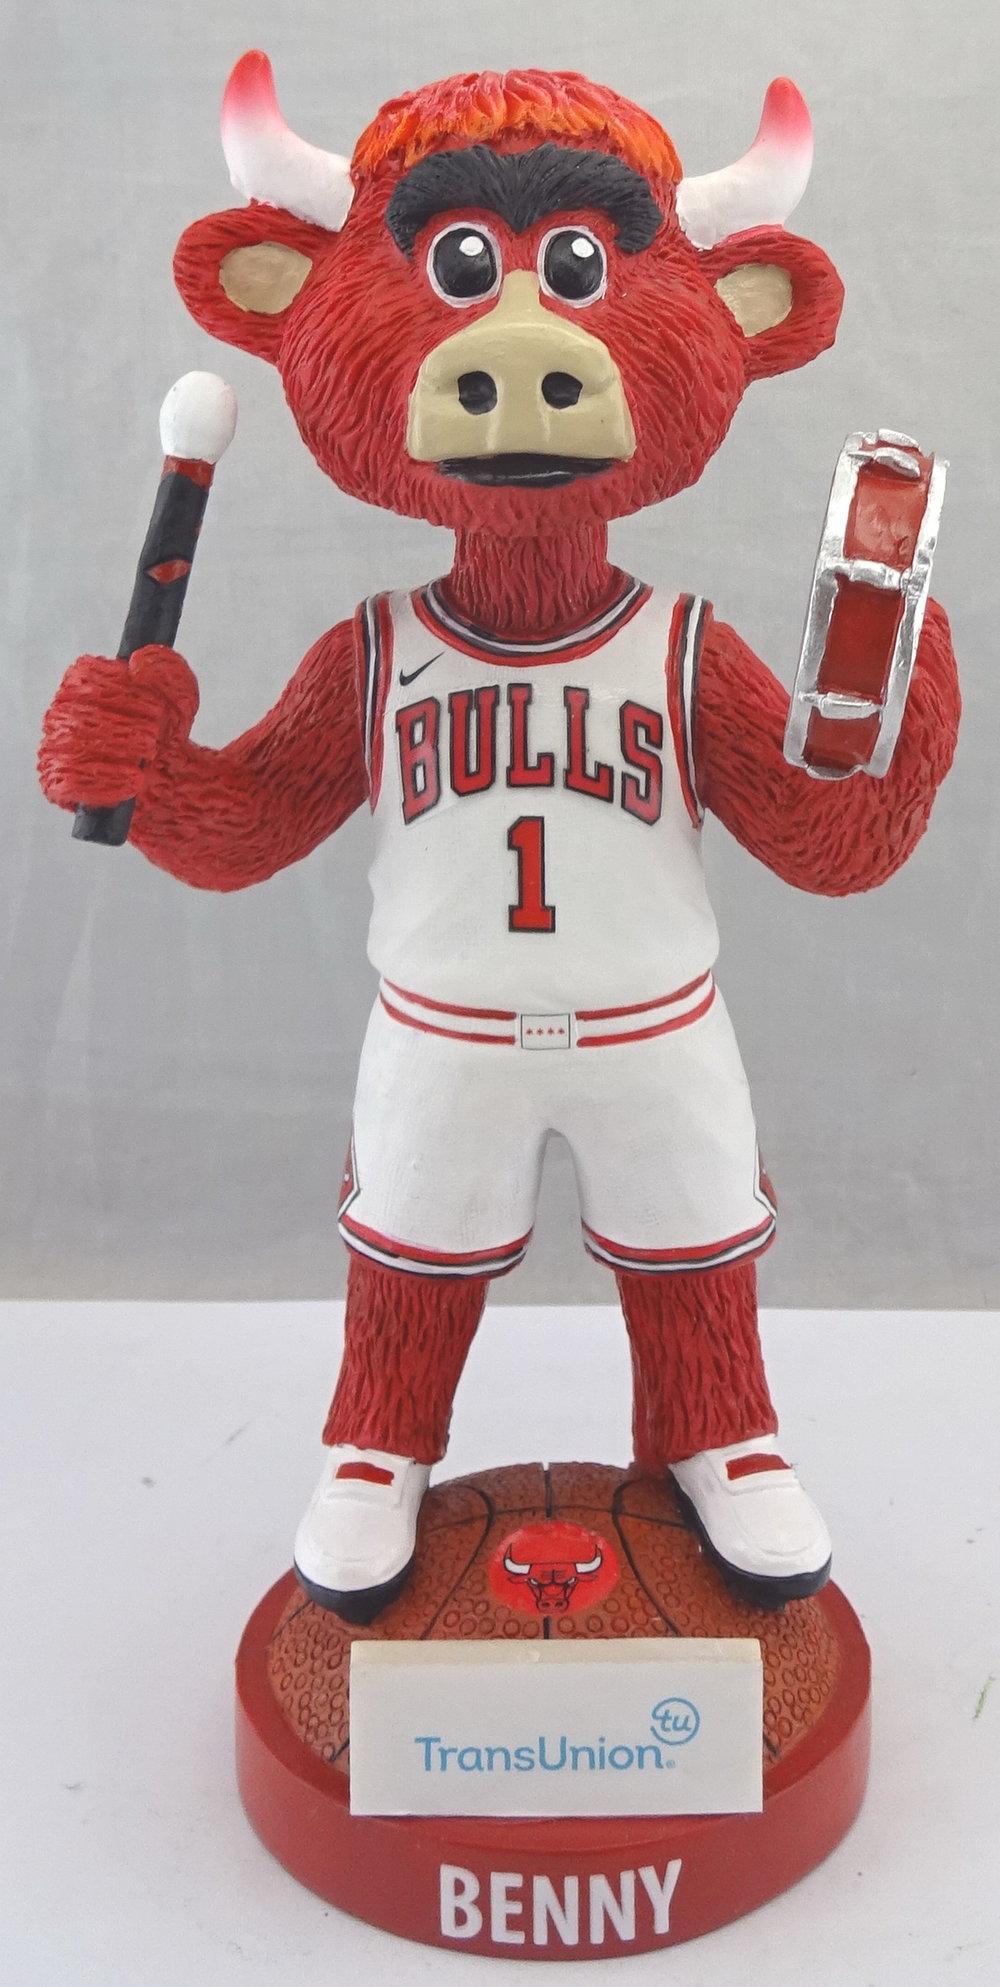 Chicago Bulls - Benny 113173, 7in Bobblehead (1).jpg